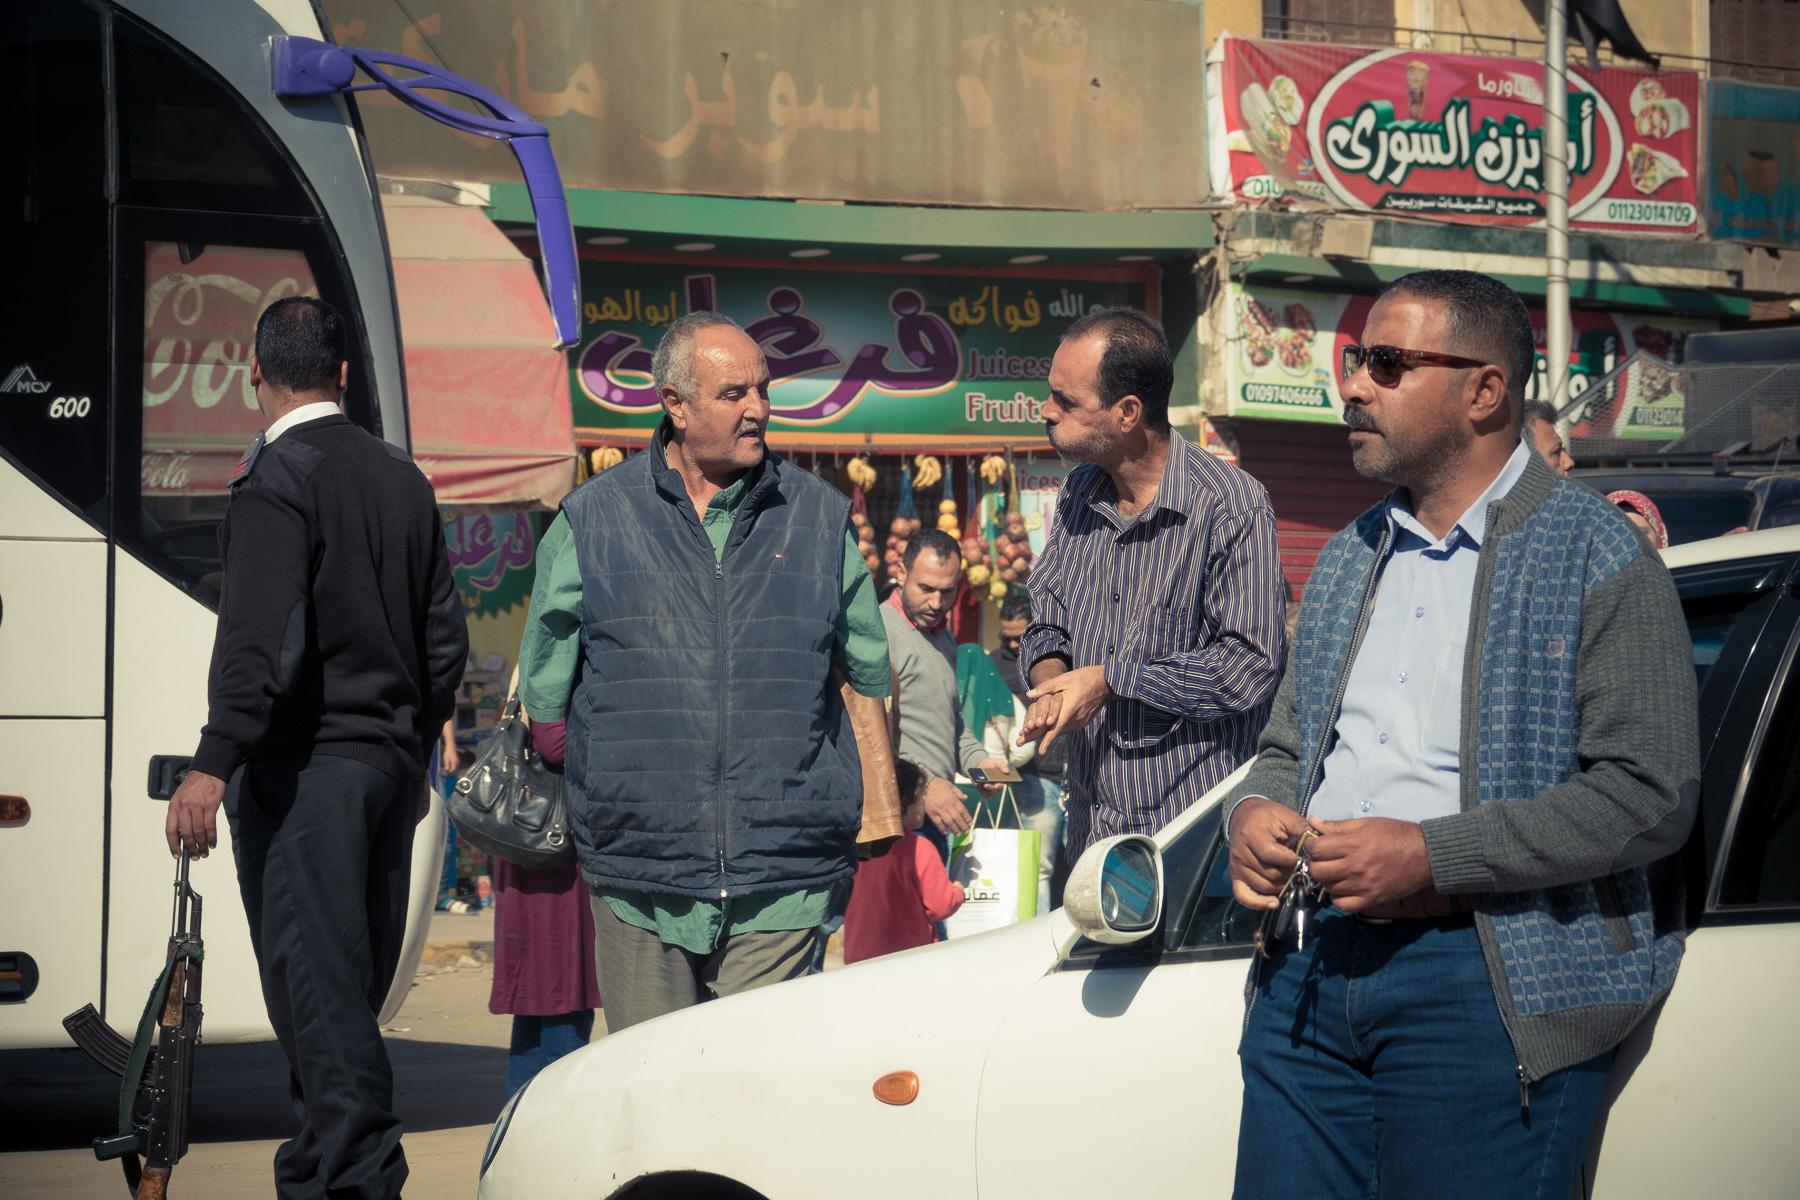 11-cairo-streets-6.jpg